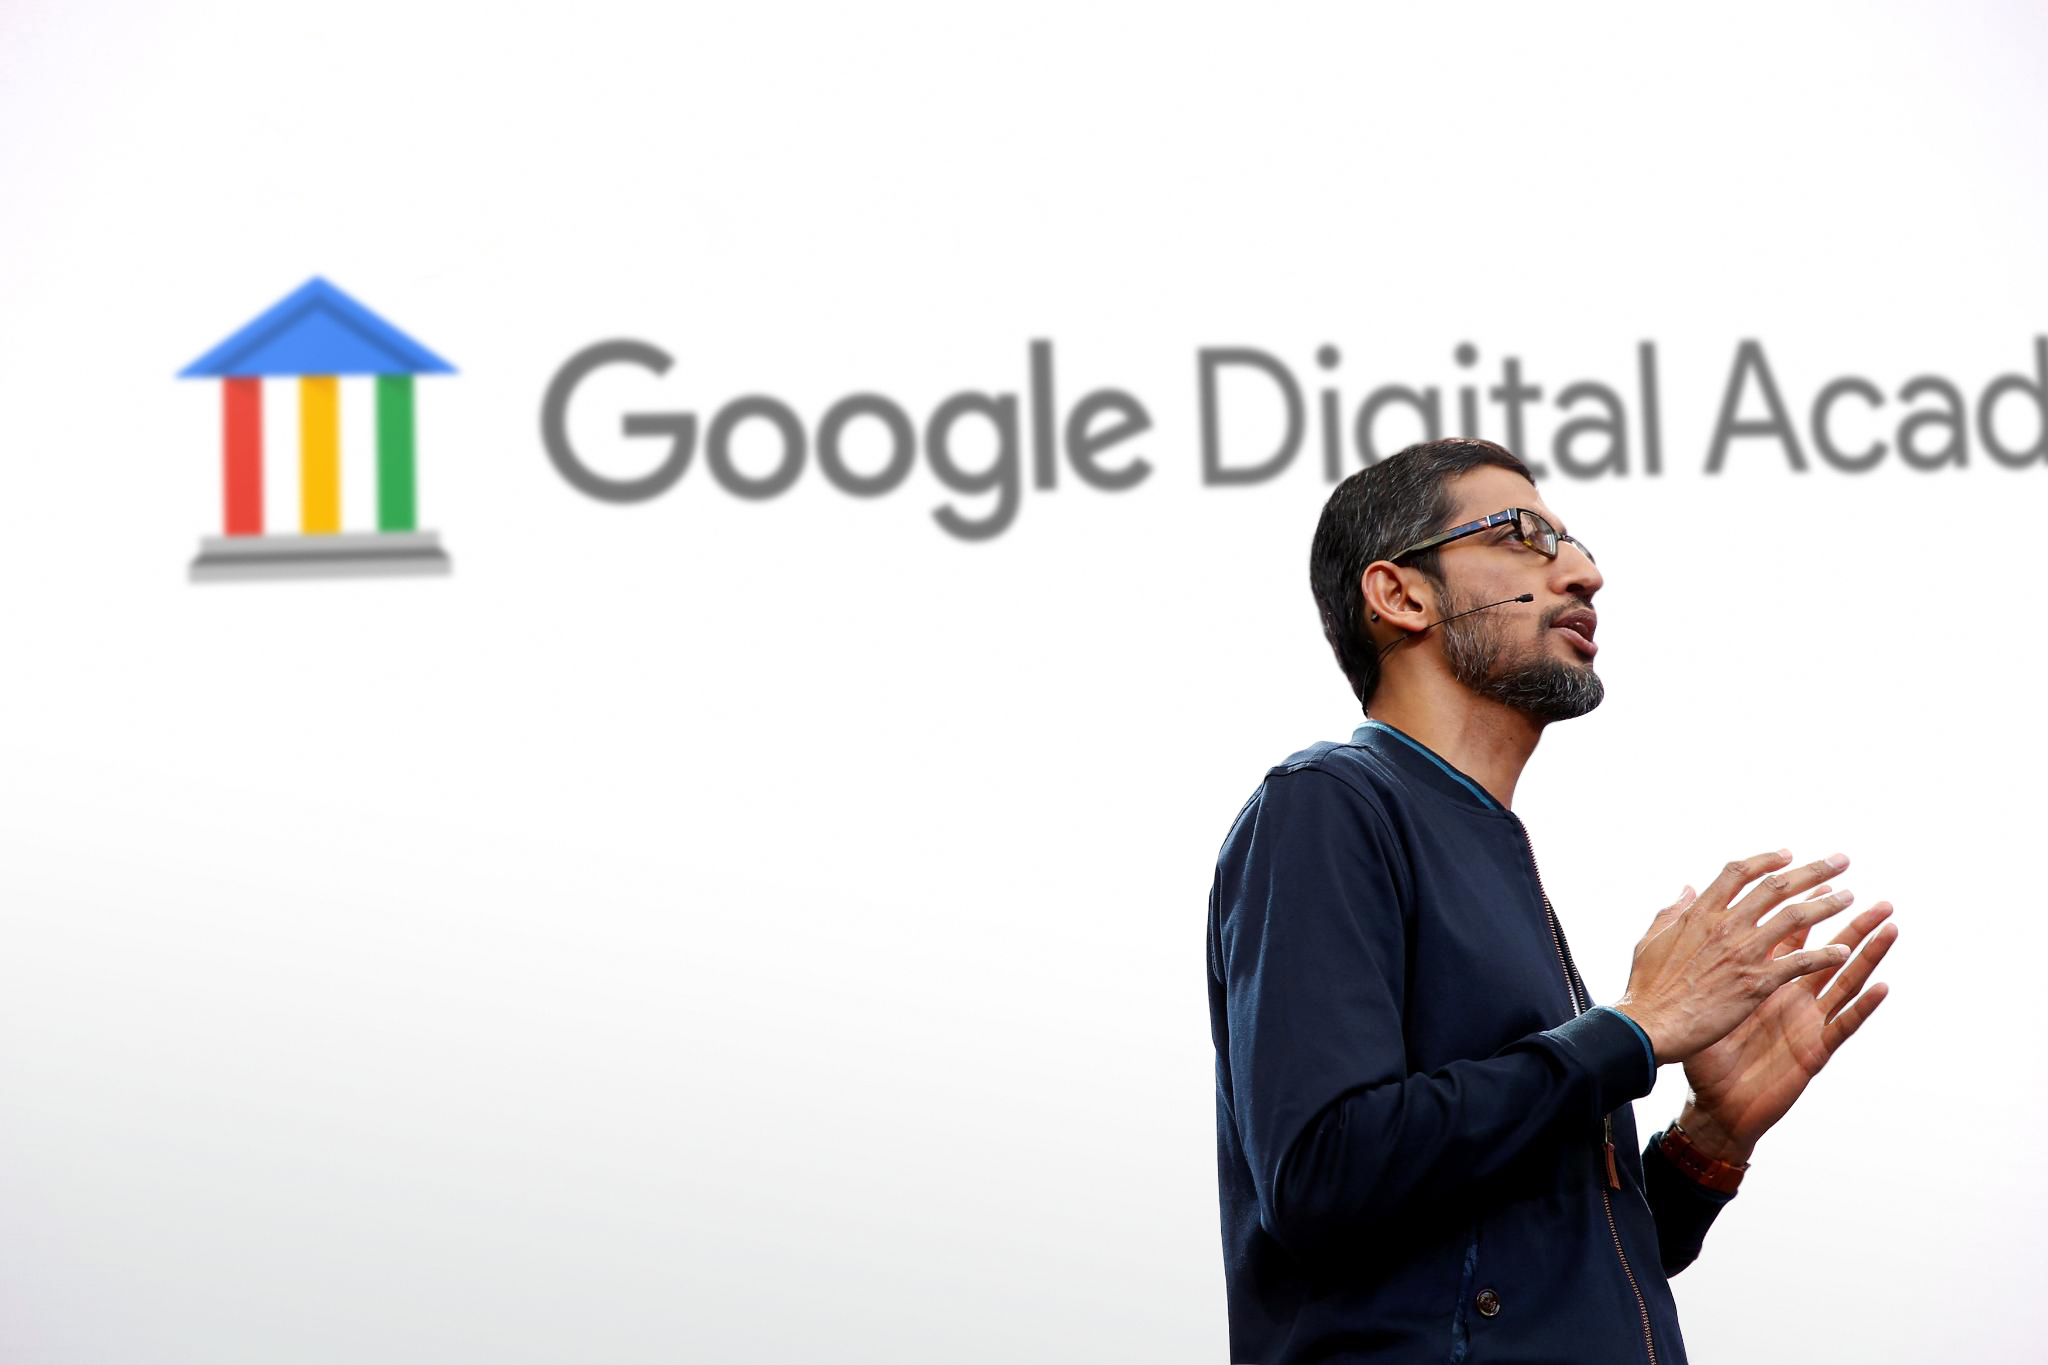 Google Digital Academy - Sundar Pichai Keynote